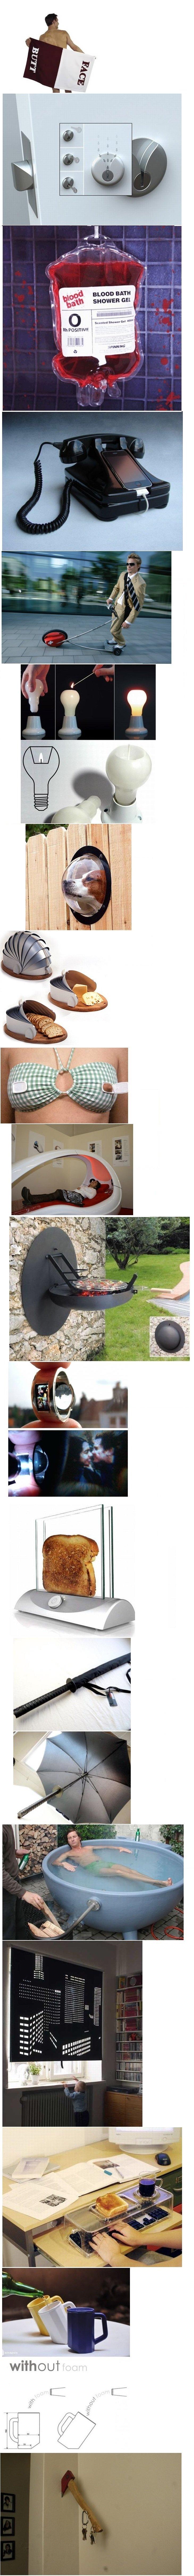 Cool & weird inventions. 100 % OC +50 thumbs for moar! . BLOOD BATH littl SHOWER an inventions